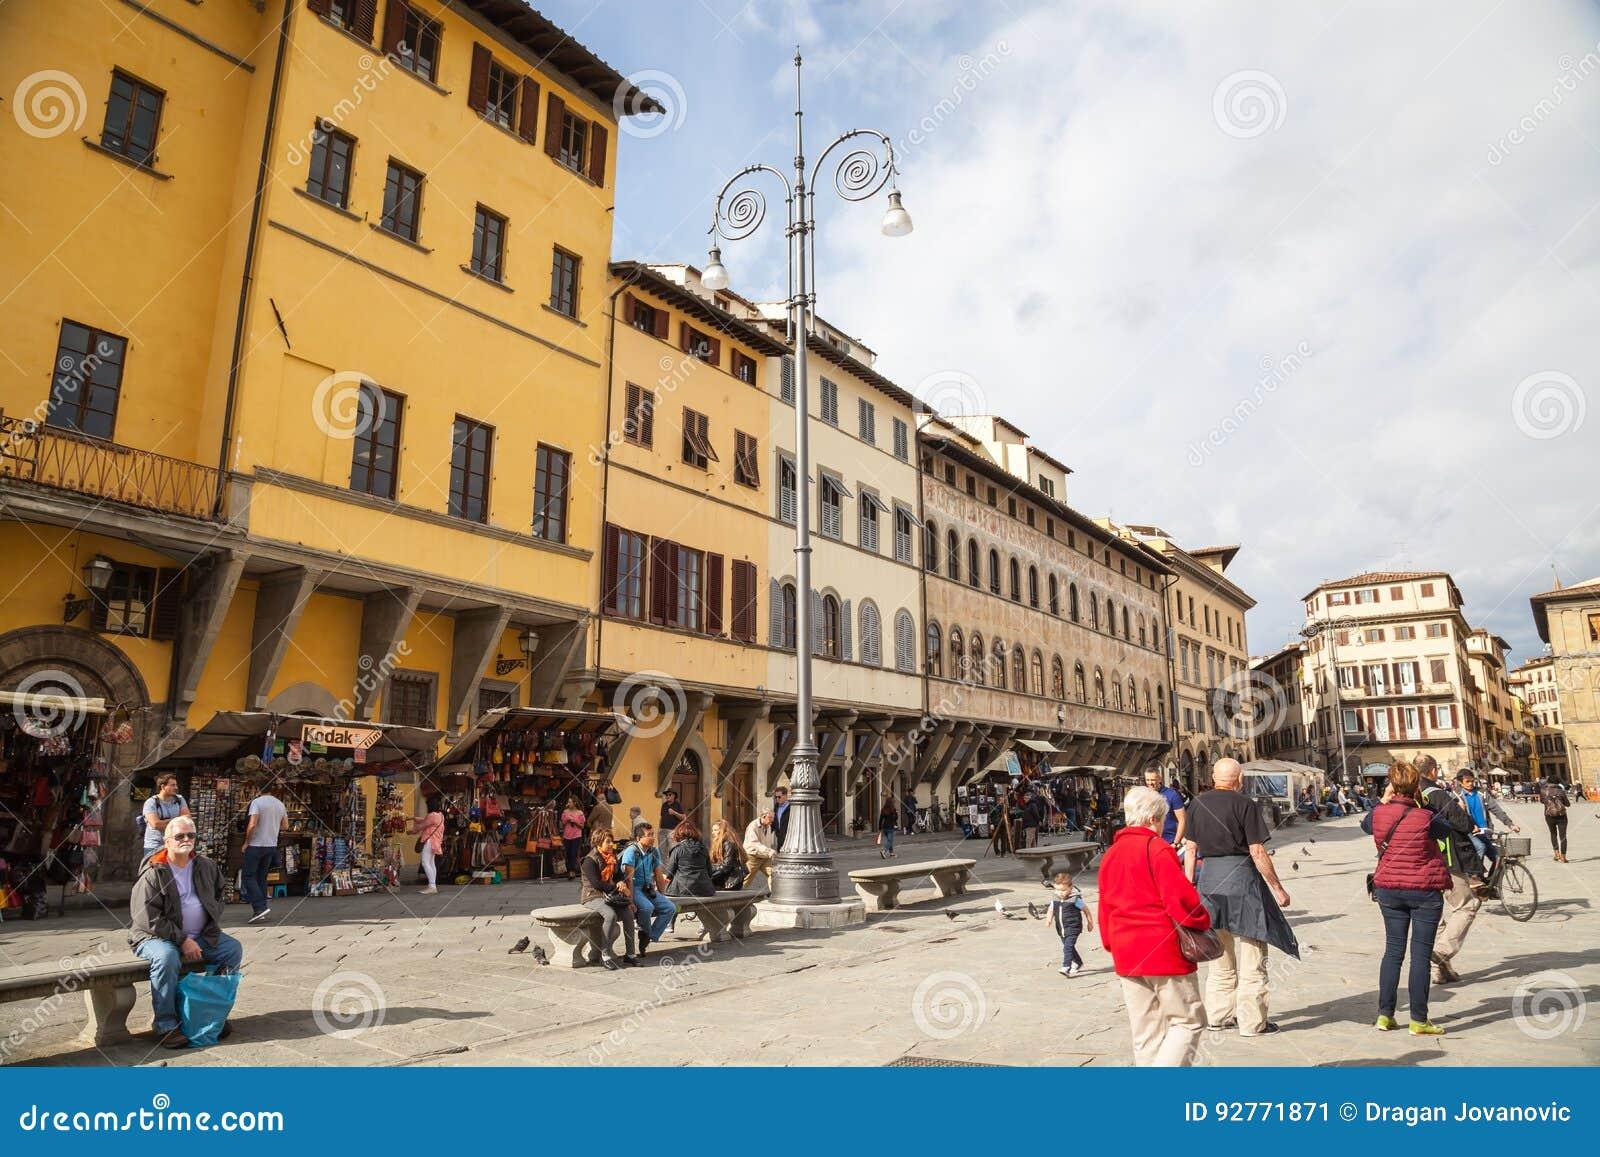 Croce二佛罗伦萨广场圣诞老人